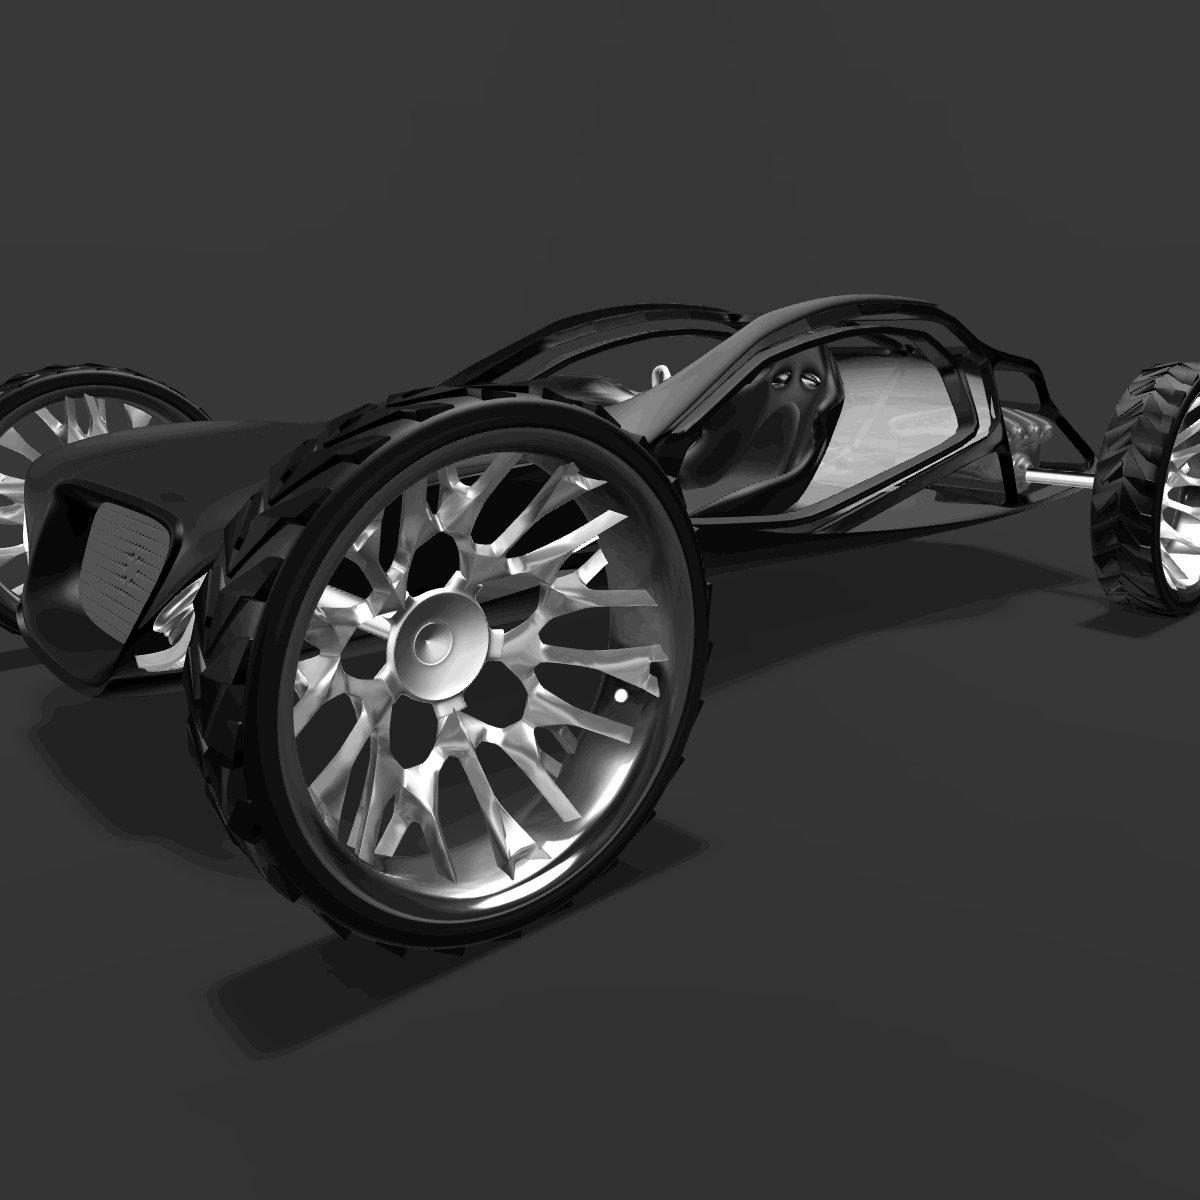 Vectary Online 3d Design Tool